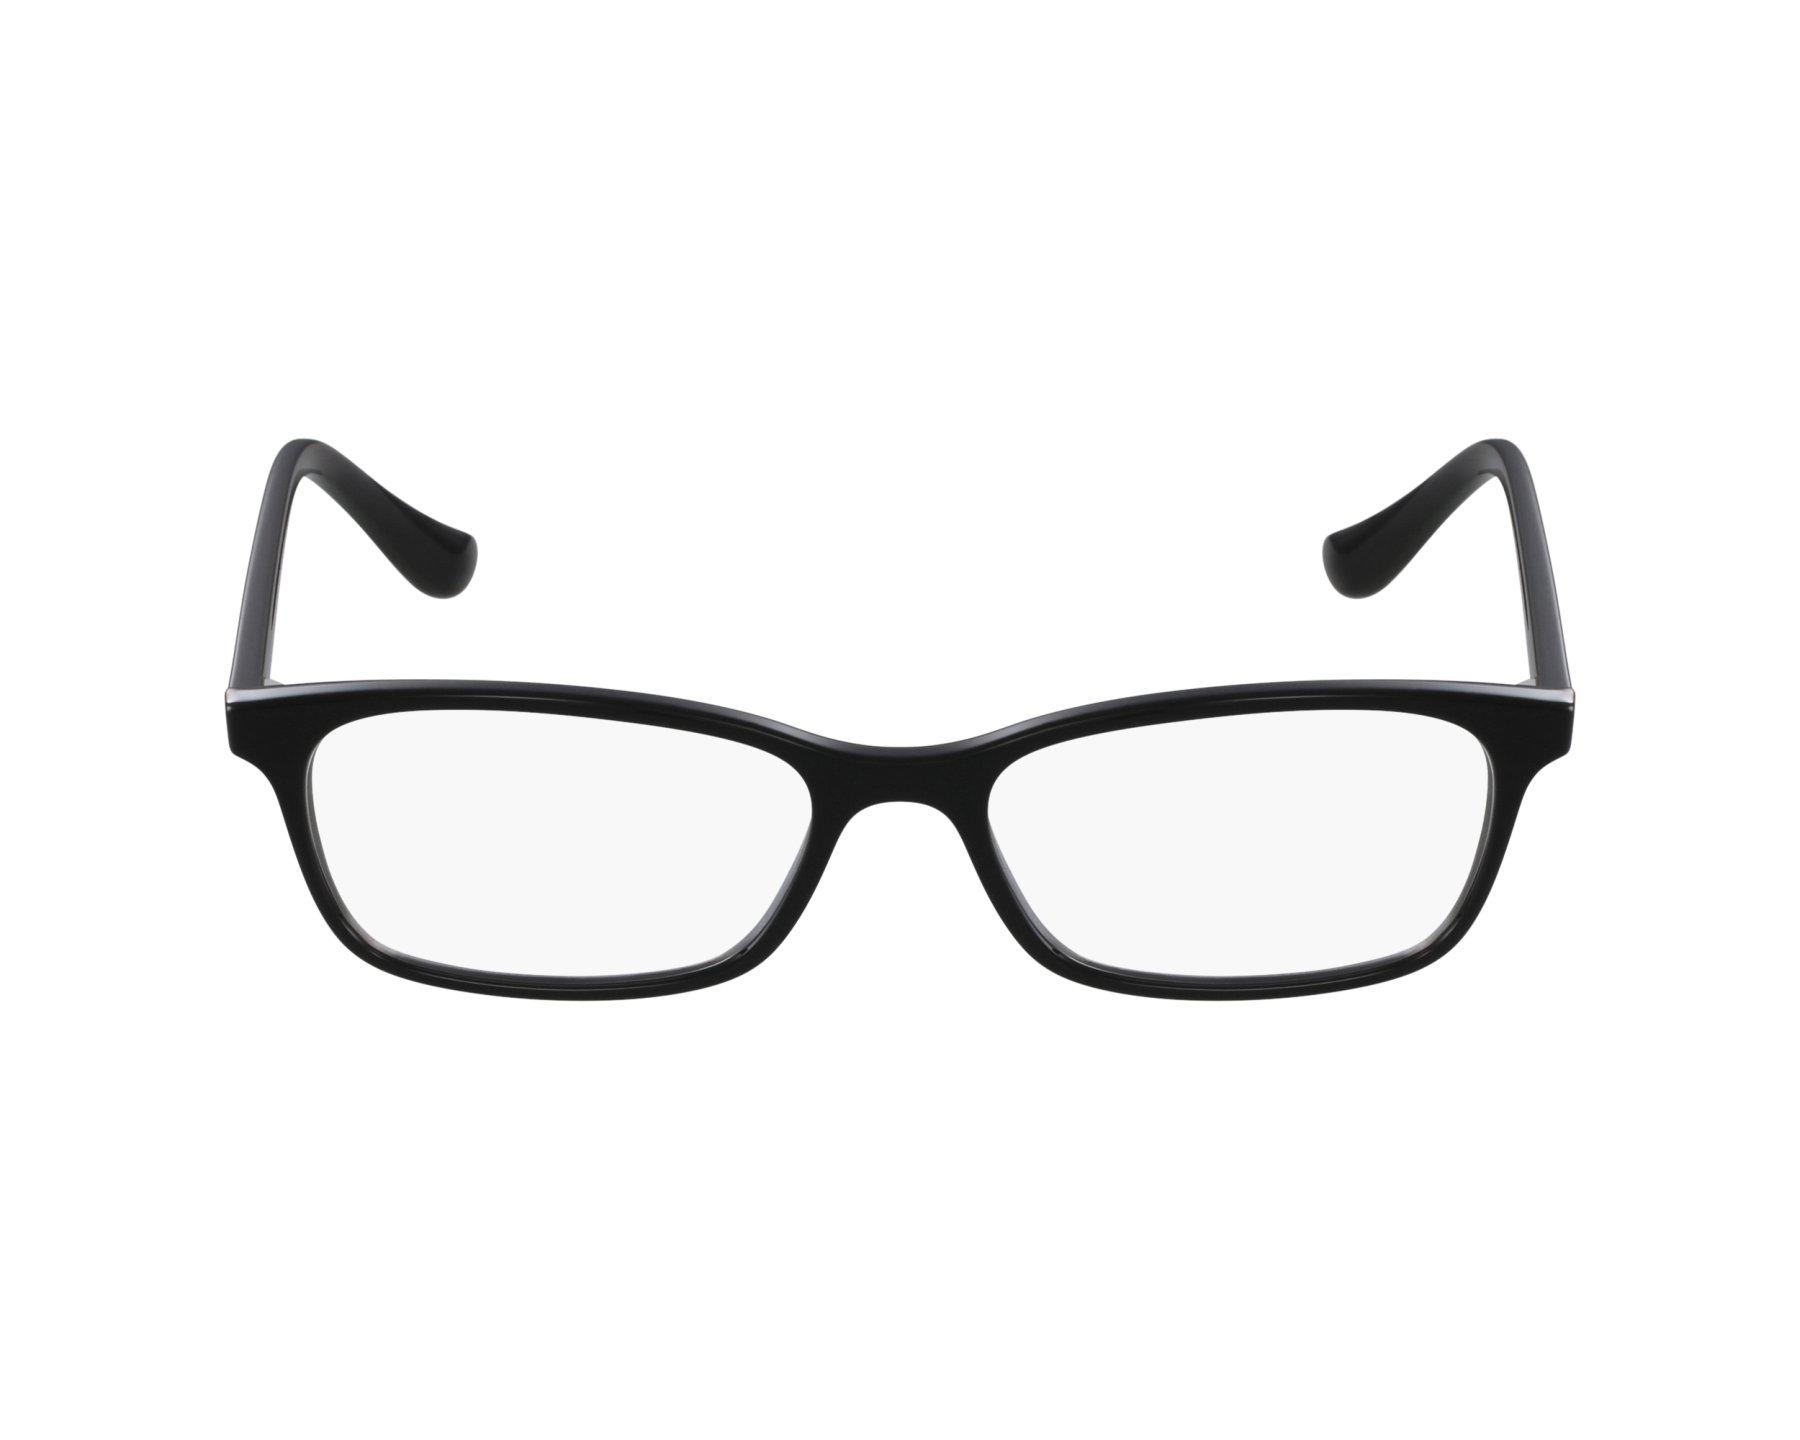 04ec471c80 eyeglasses Vogue VO-5053 W44 51-16 Black profile view